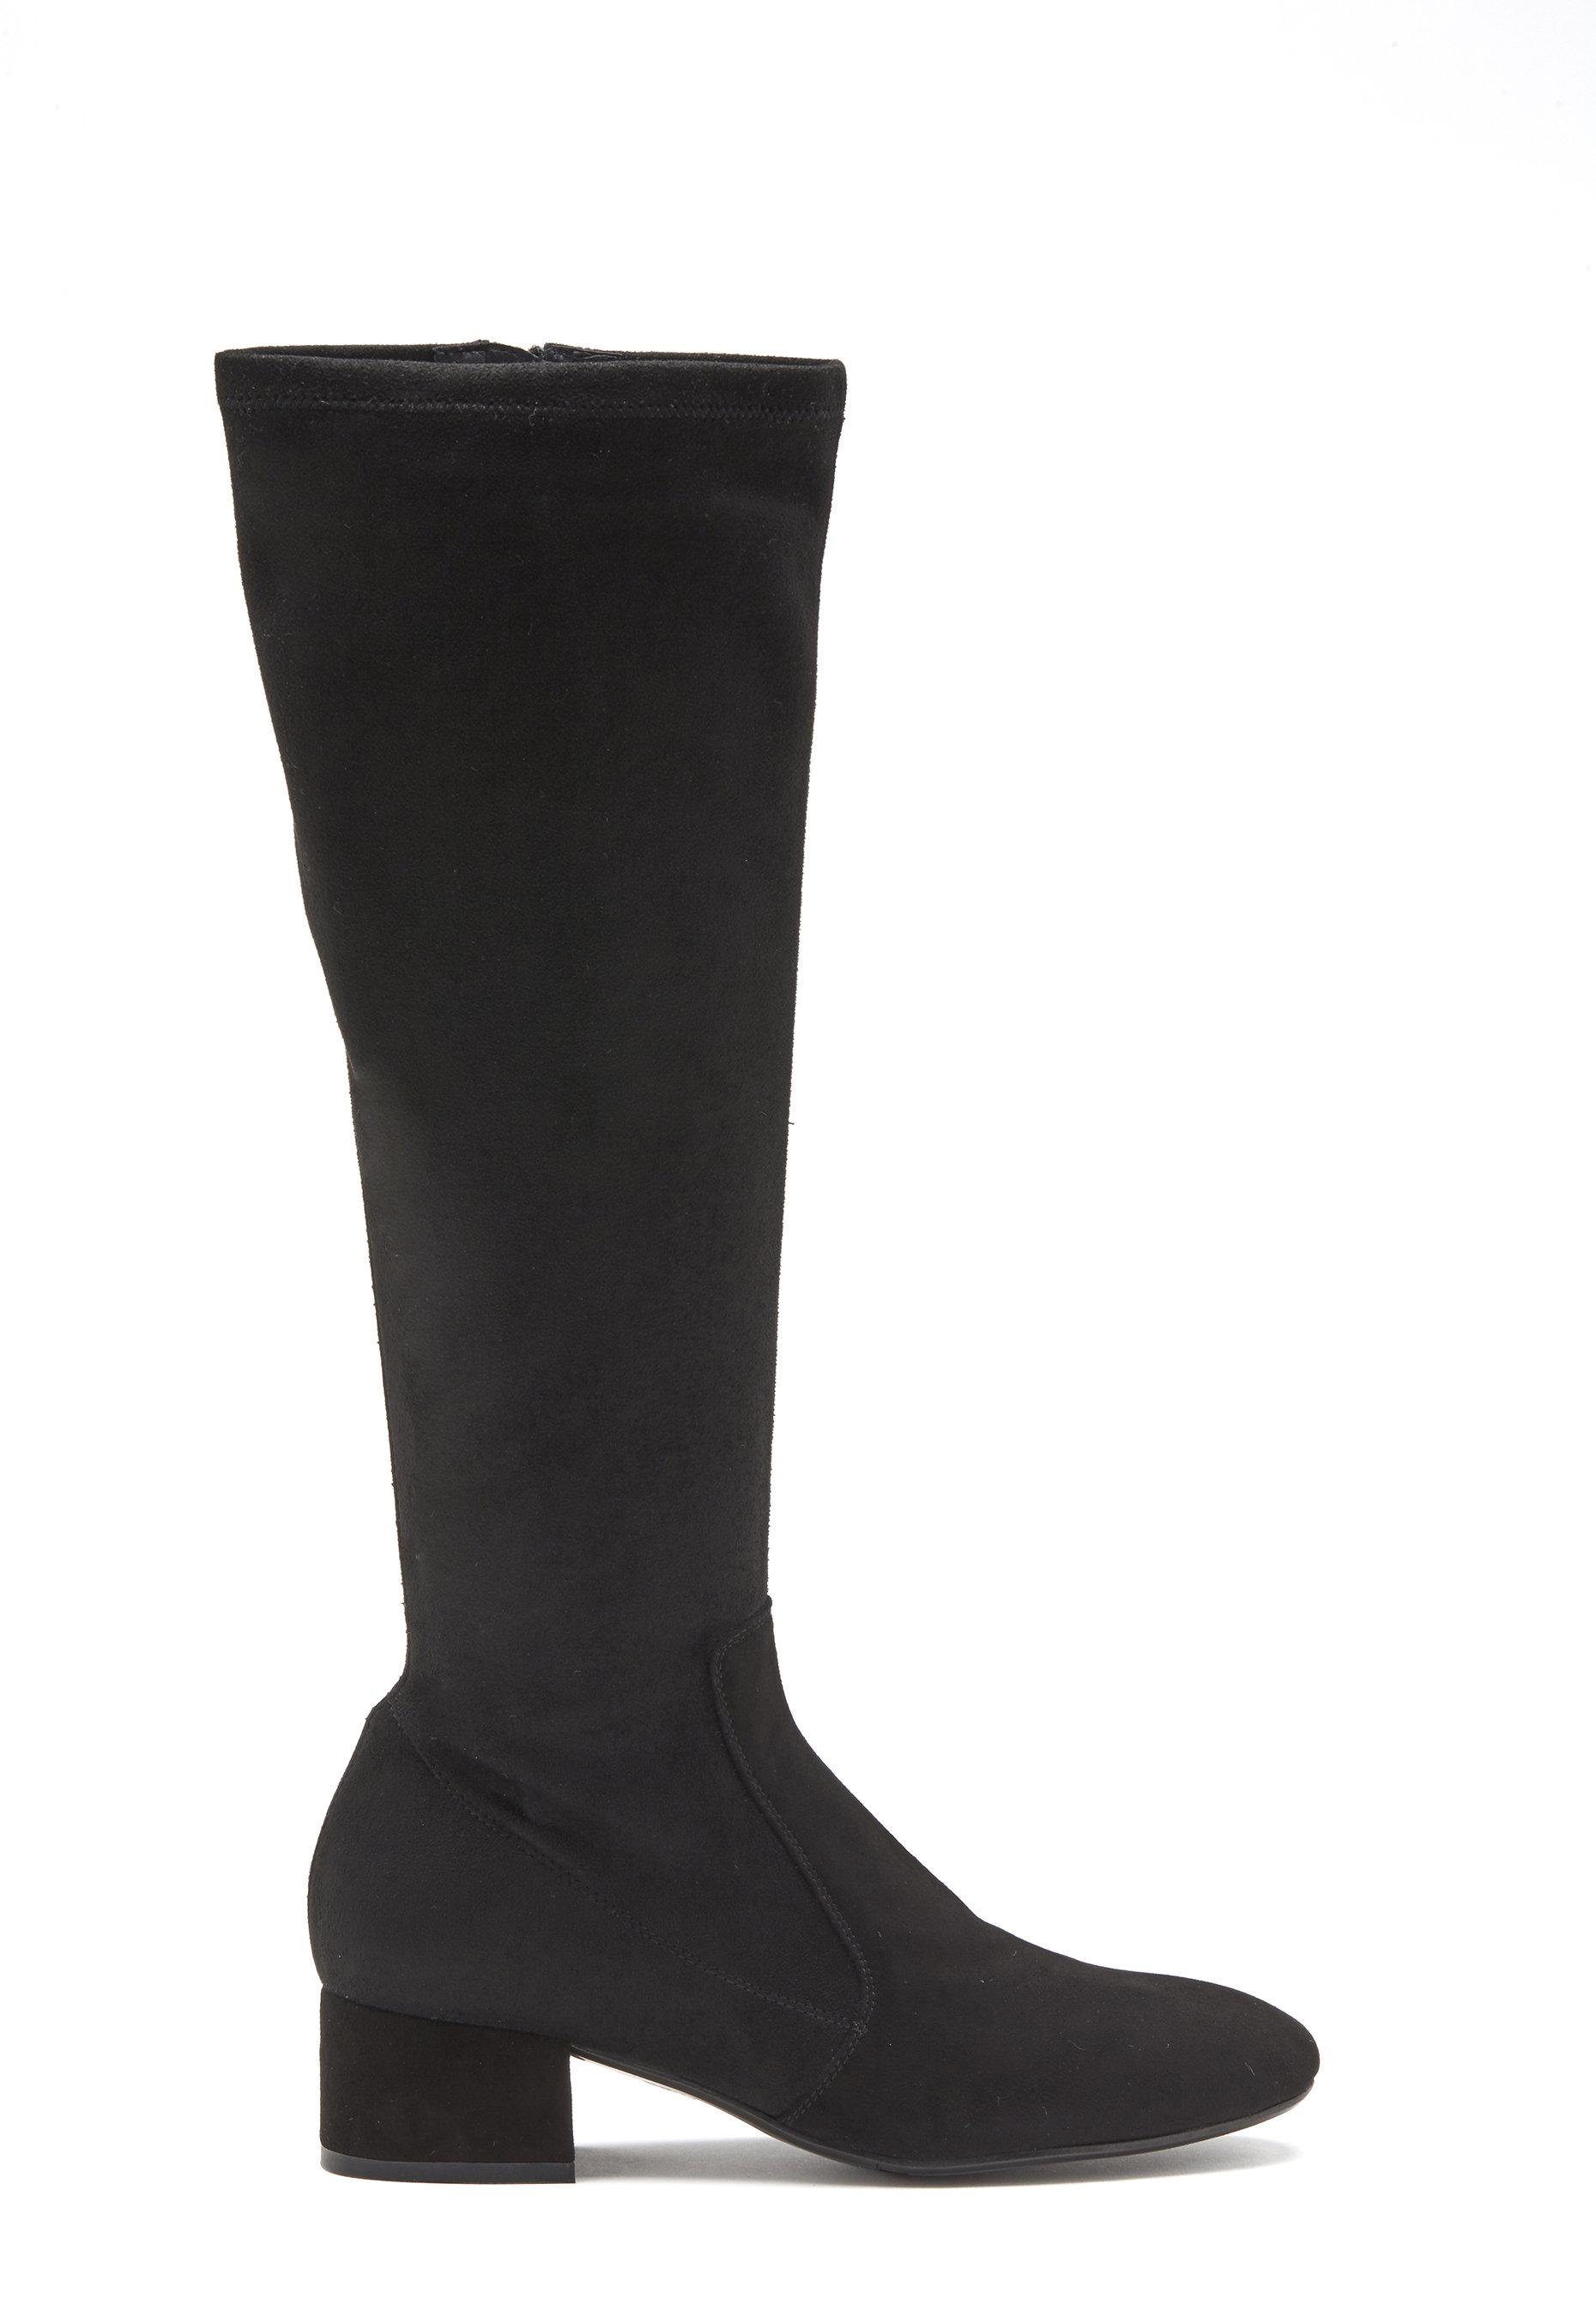 Billi Bi Suede Stretch Long Boots Black Bubbleroom